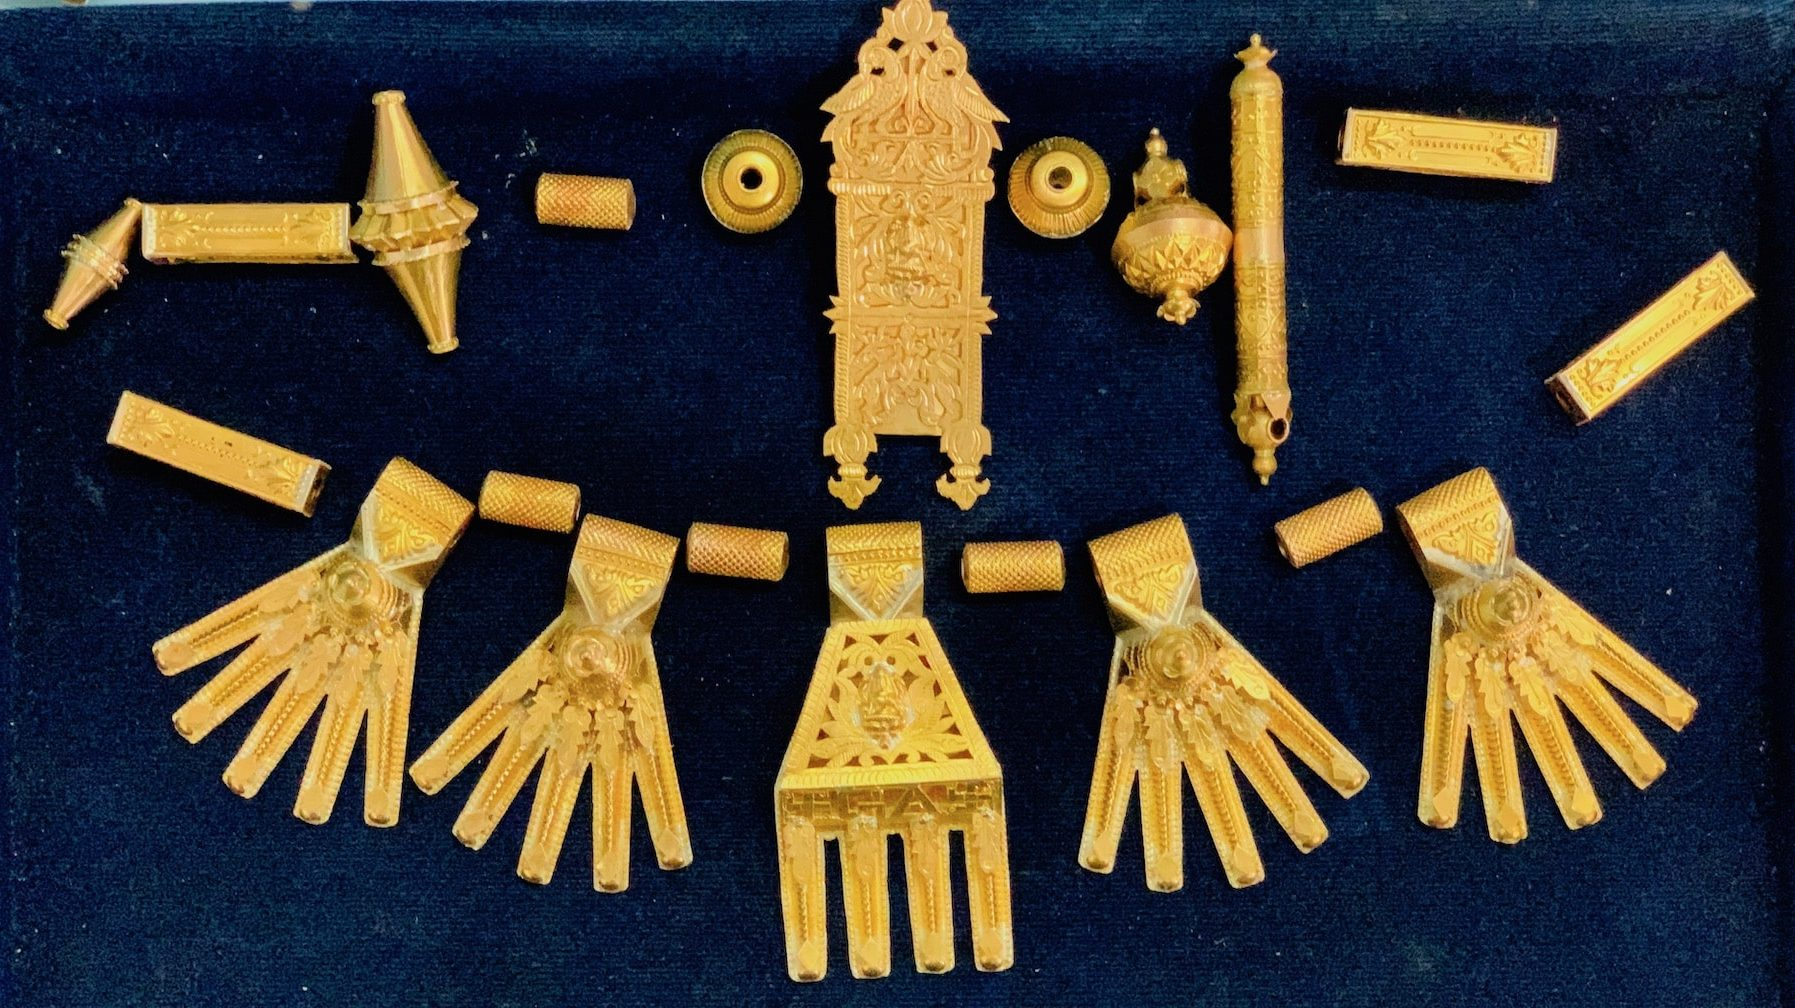 Parts of a kalathiru necklace